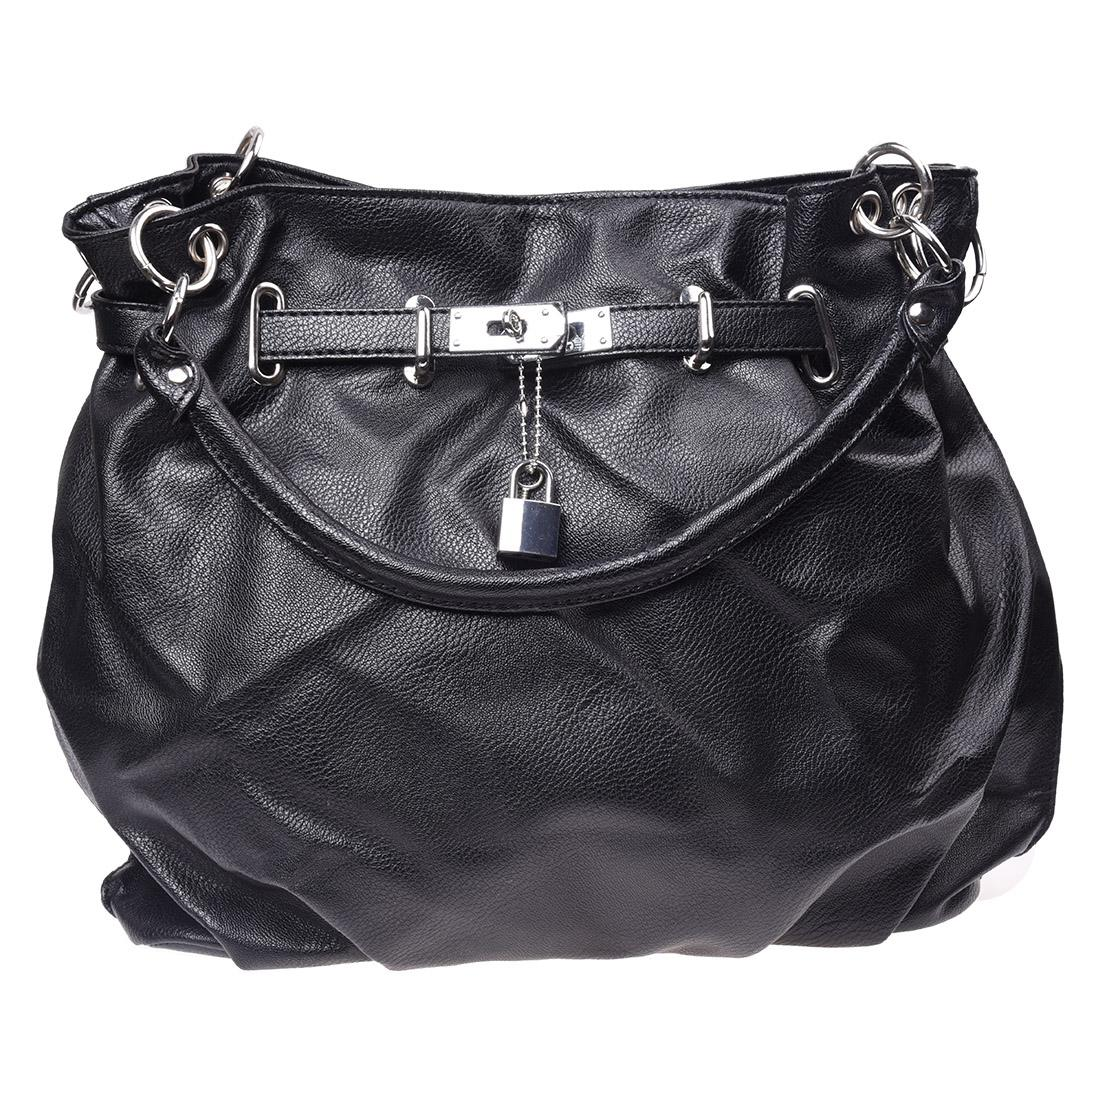 5 X SNNY Girls PU Leather Hobo Handbag Bag Tote Shoulder Cross Body Black ingersoll i01002